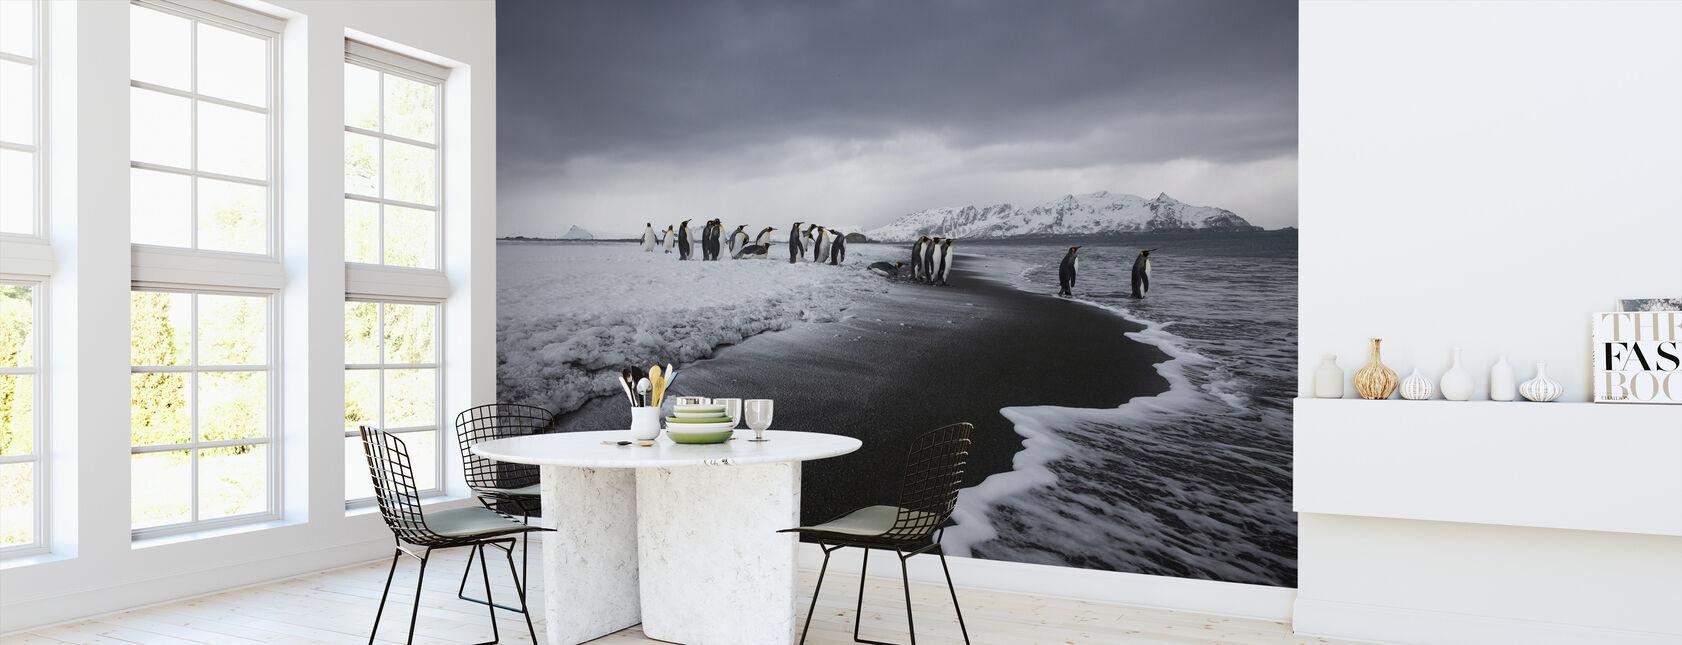 Group of King Penguins, Antarctica - Wallpaper - Kitchen